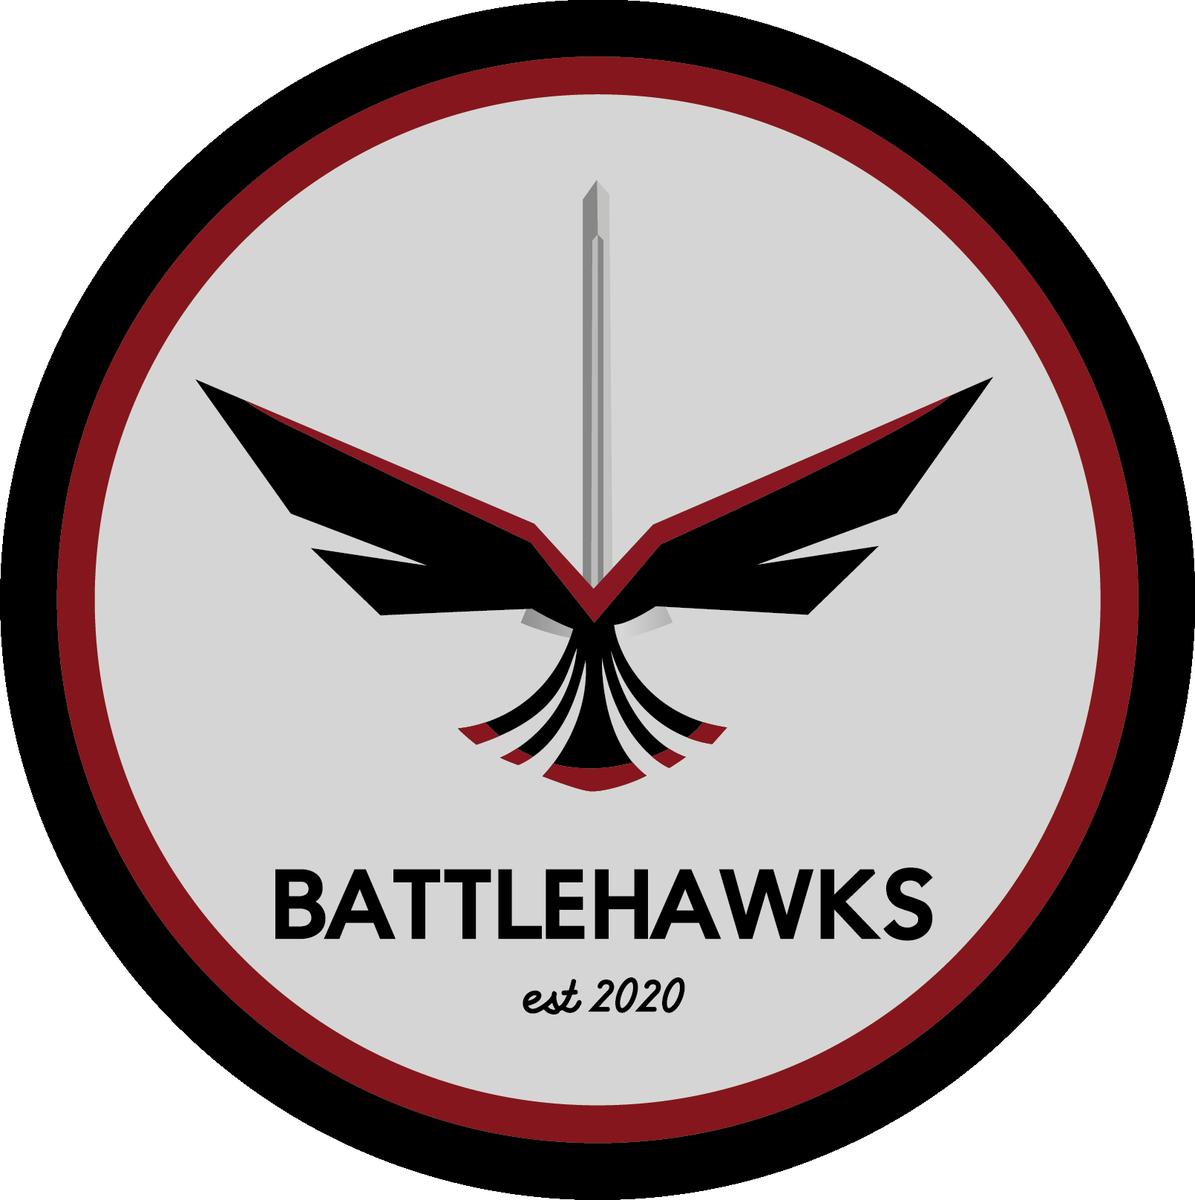 🚨Trade Alert🚨  - Battlehawks to Gators:  Victor Olofsson  - Gators to Battlehawks:  Wayne Simmonds, Philip Tomasino, Jakob Pelletier, 2022 1st Round Pick  @BattlehawksUFFS @Gators_UFHL   #Battlehawks #Gators #UFHLTrades